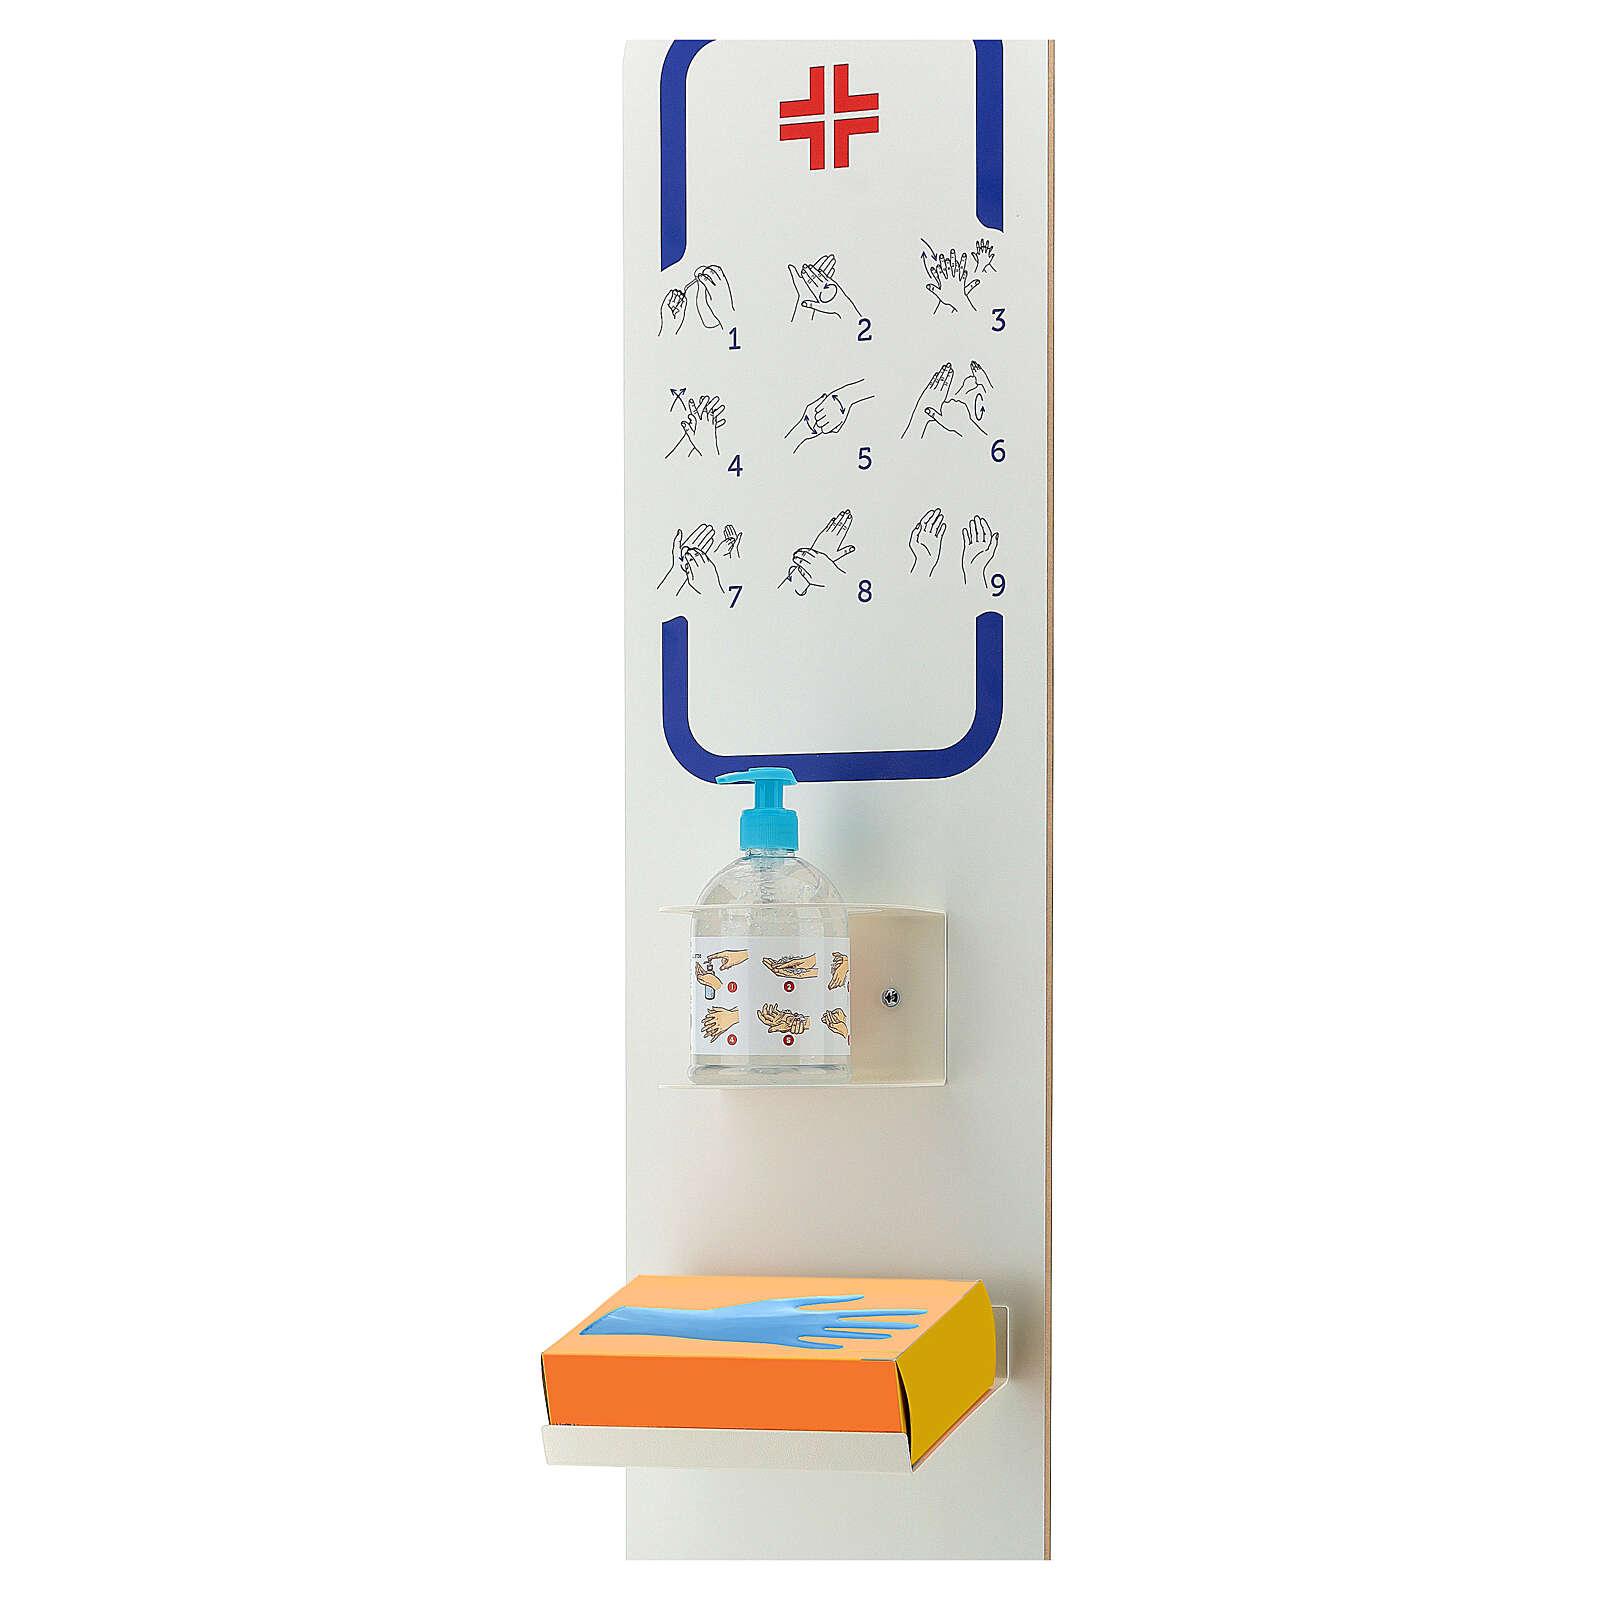 Free standing hand sanitizer dispenser 3